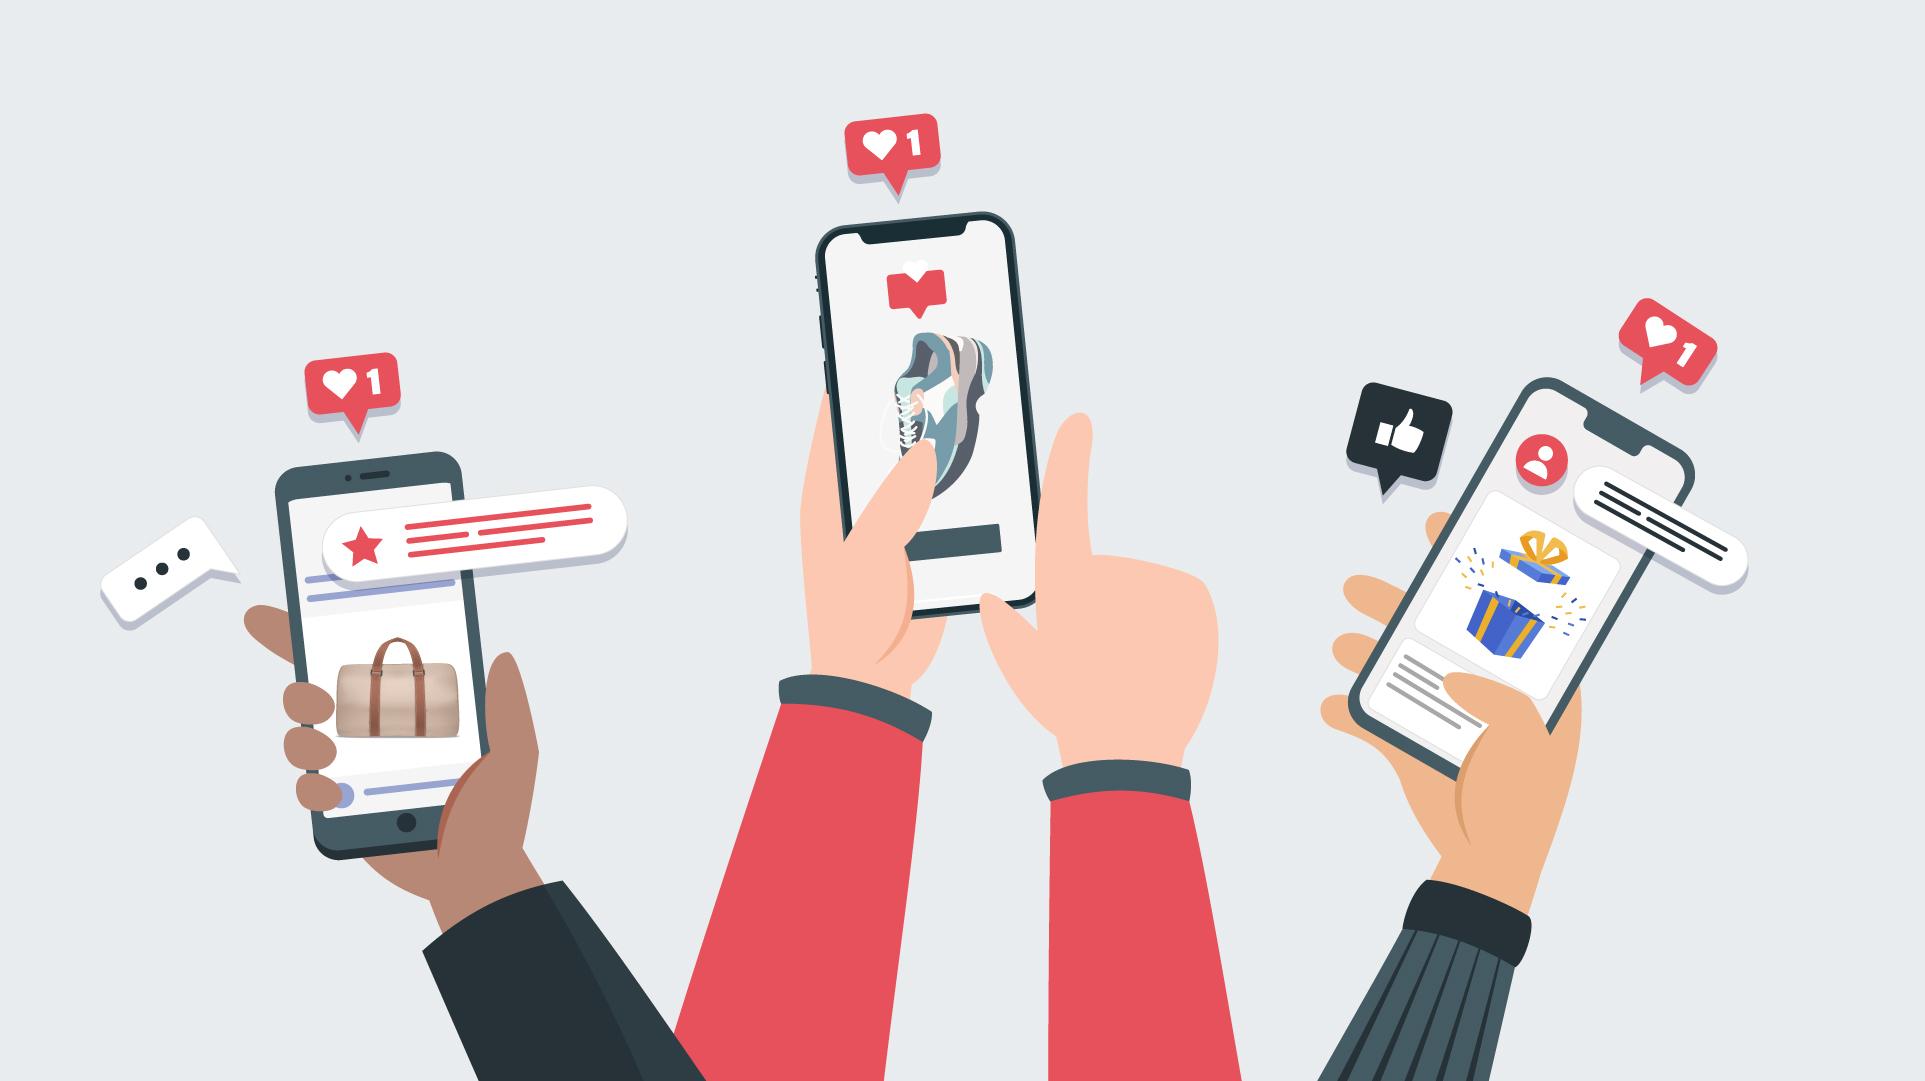 Distribute Across Social Media